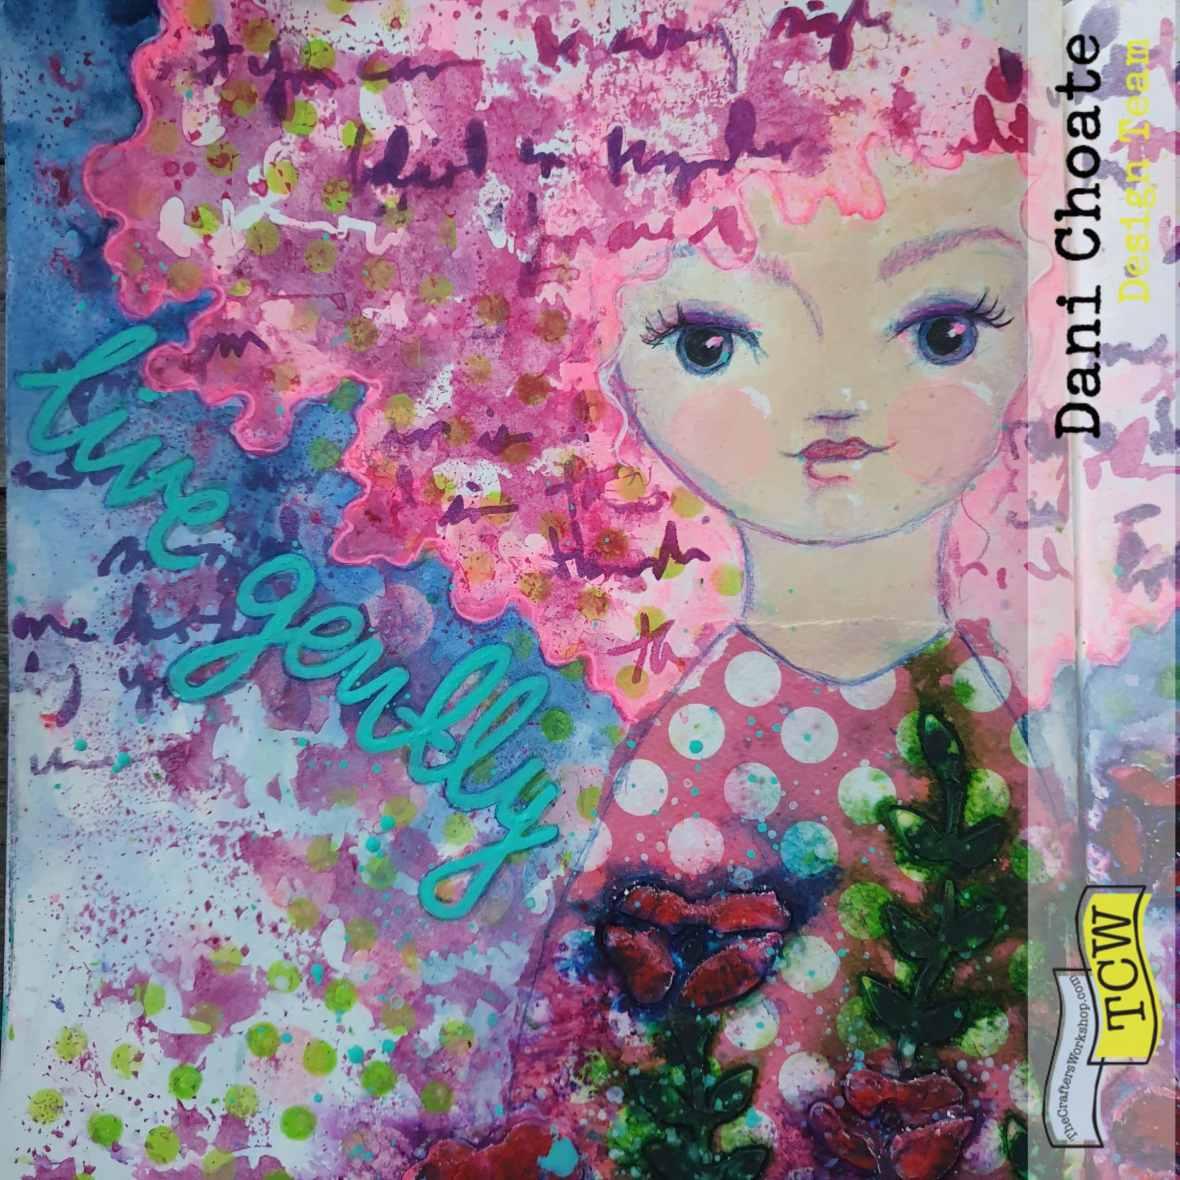 TCW541 - Believe script mixed media art journal page